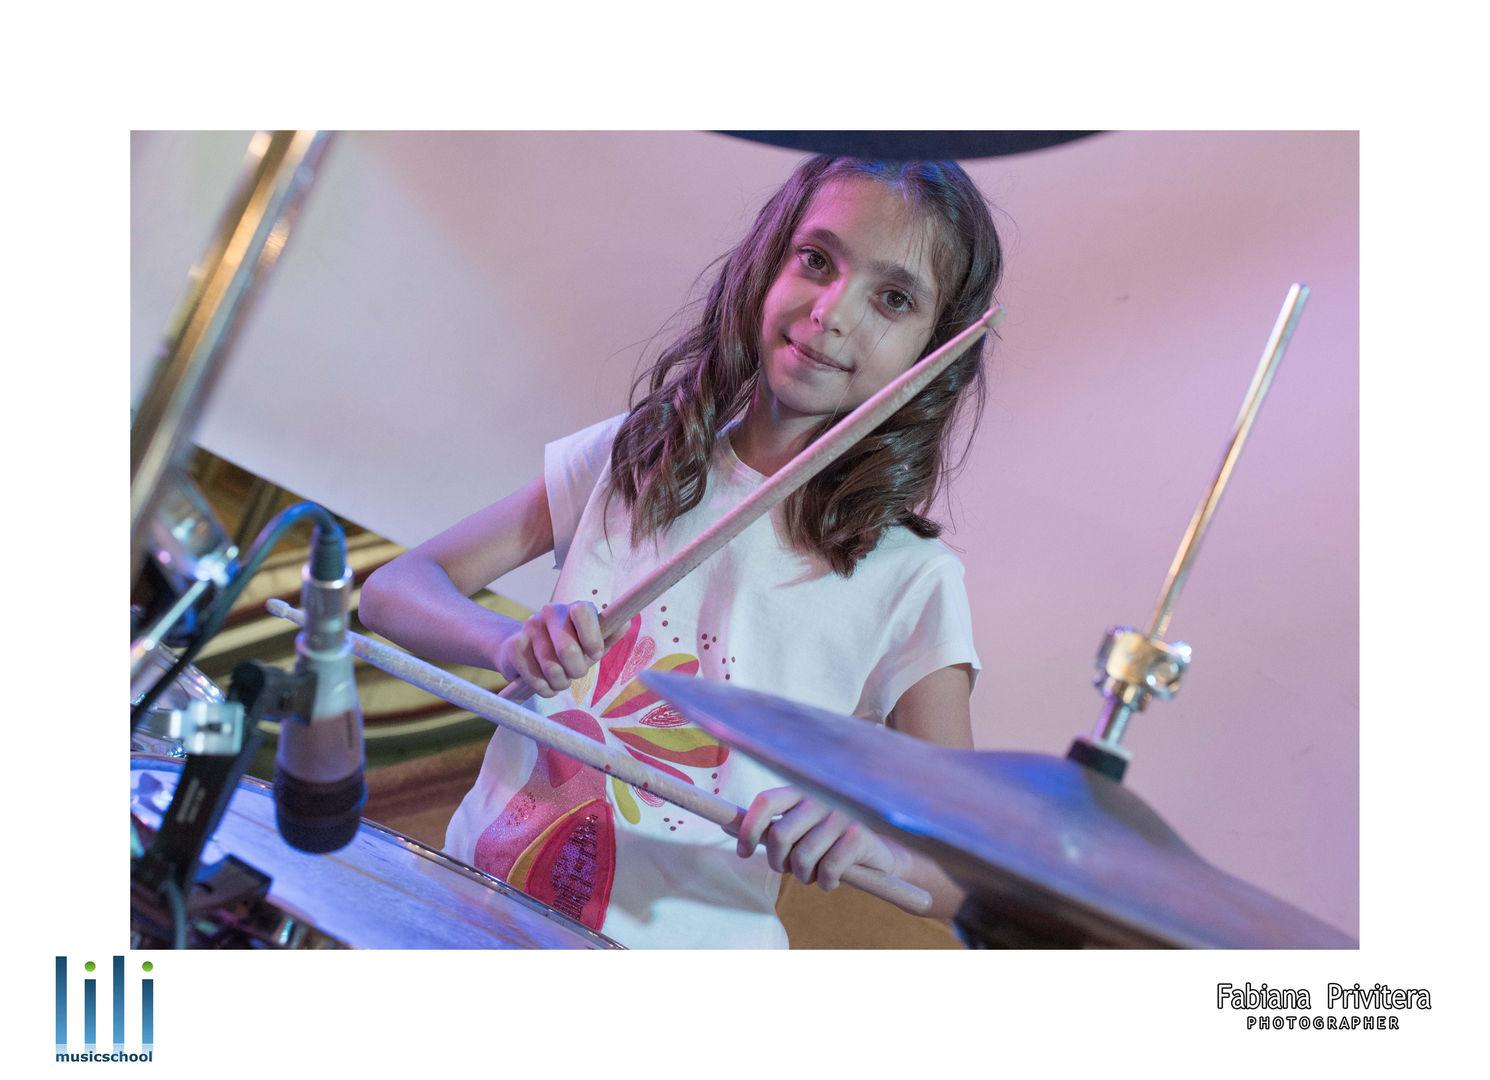 Bimbi lili 2018 Fabiana Privitera Photographer (7).jpg